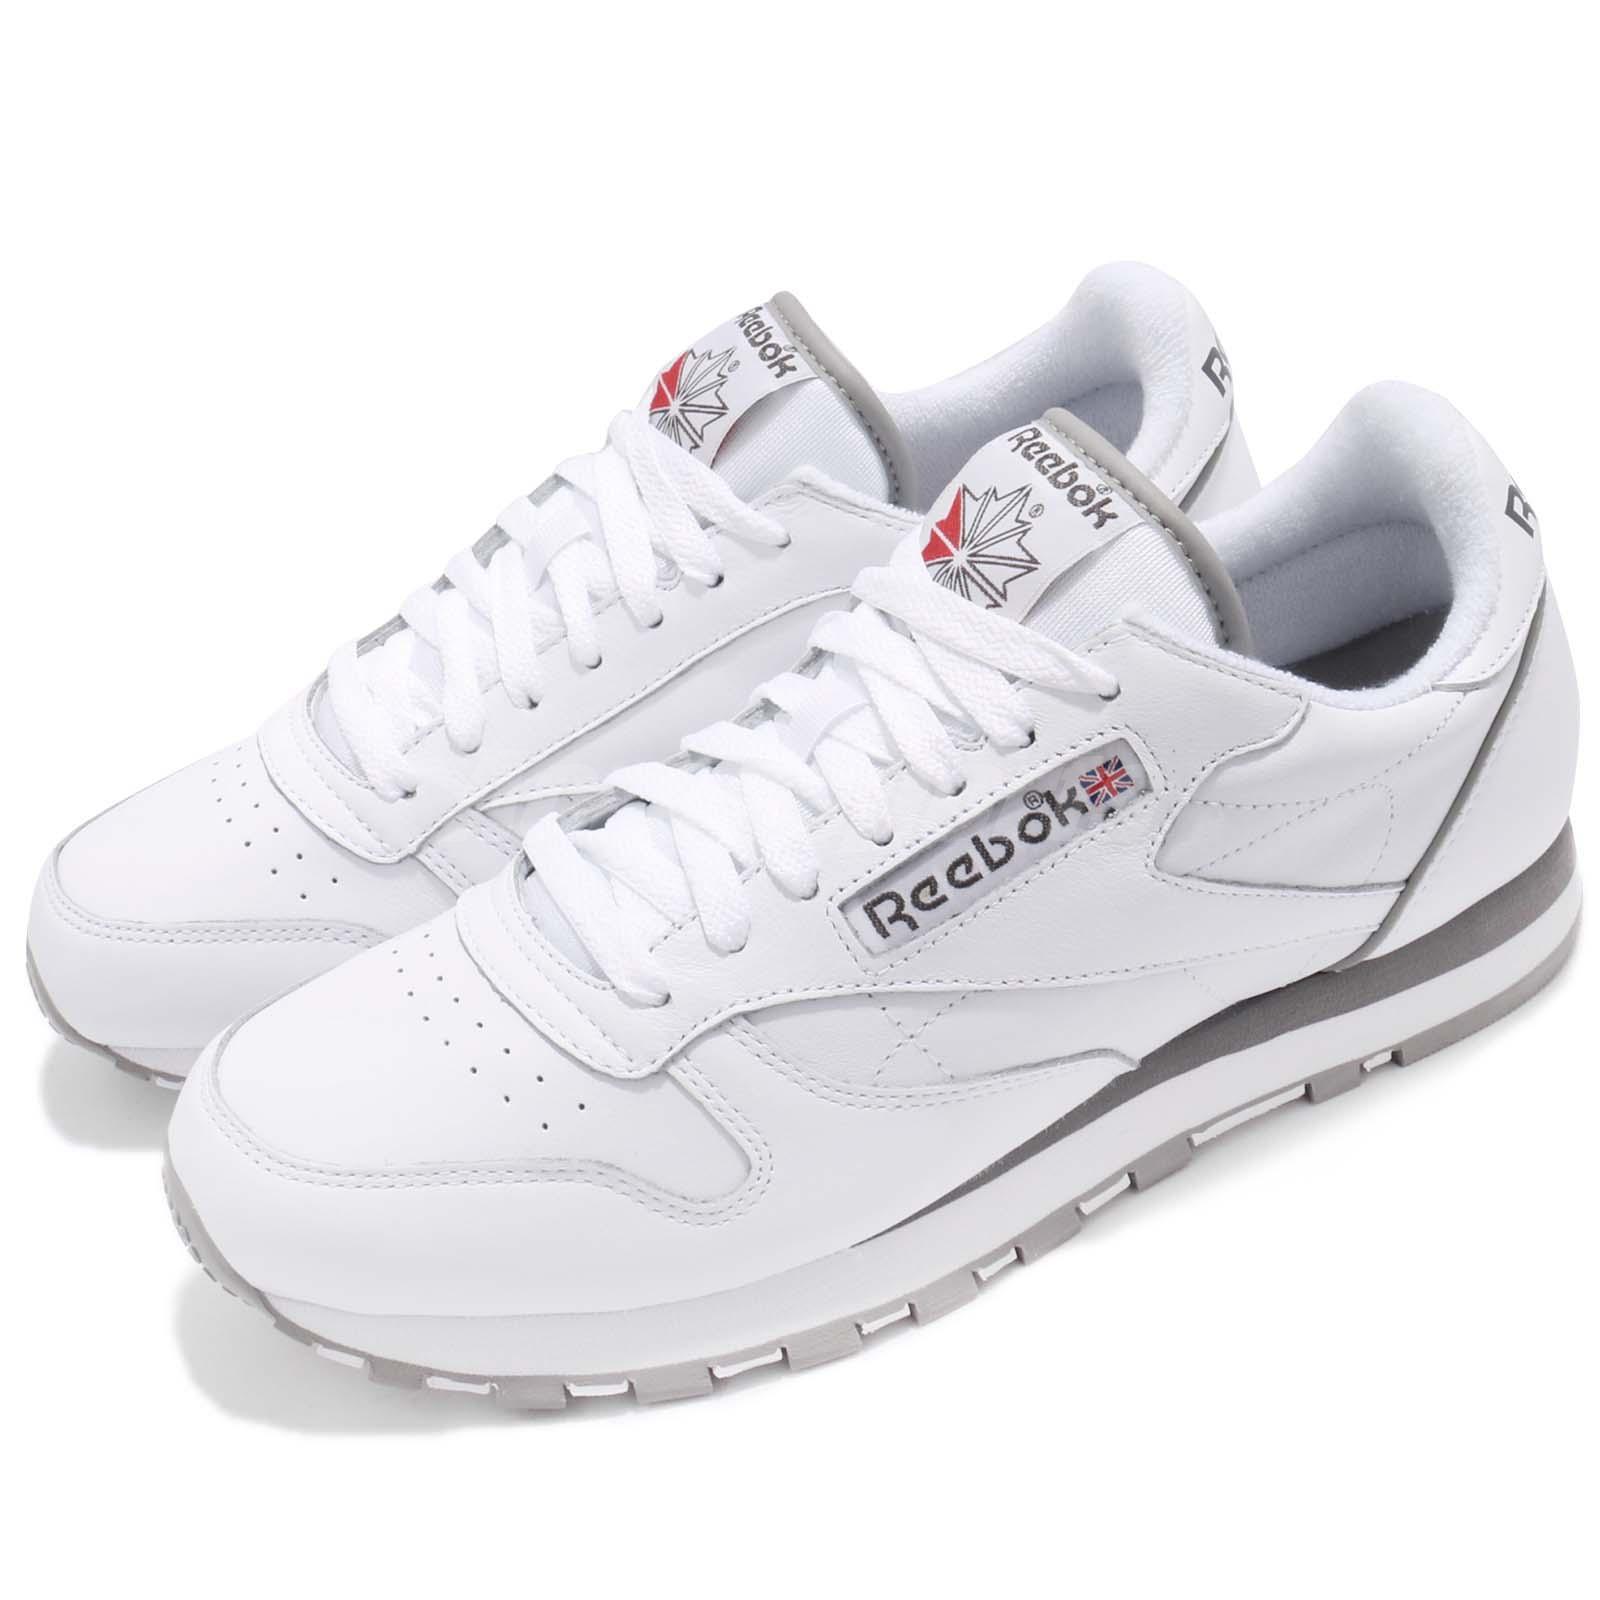 3af8e0042136 Details about Reebok Classic CL Leather Archive White Carbon Grey Men Shoes  Sneakers CM9670